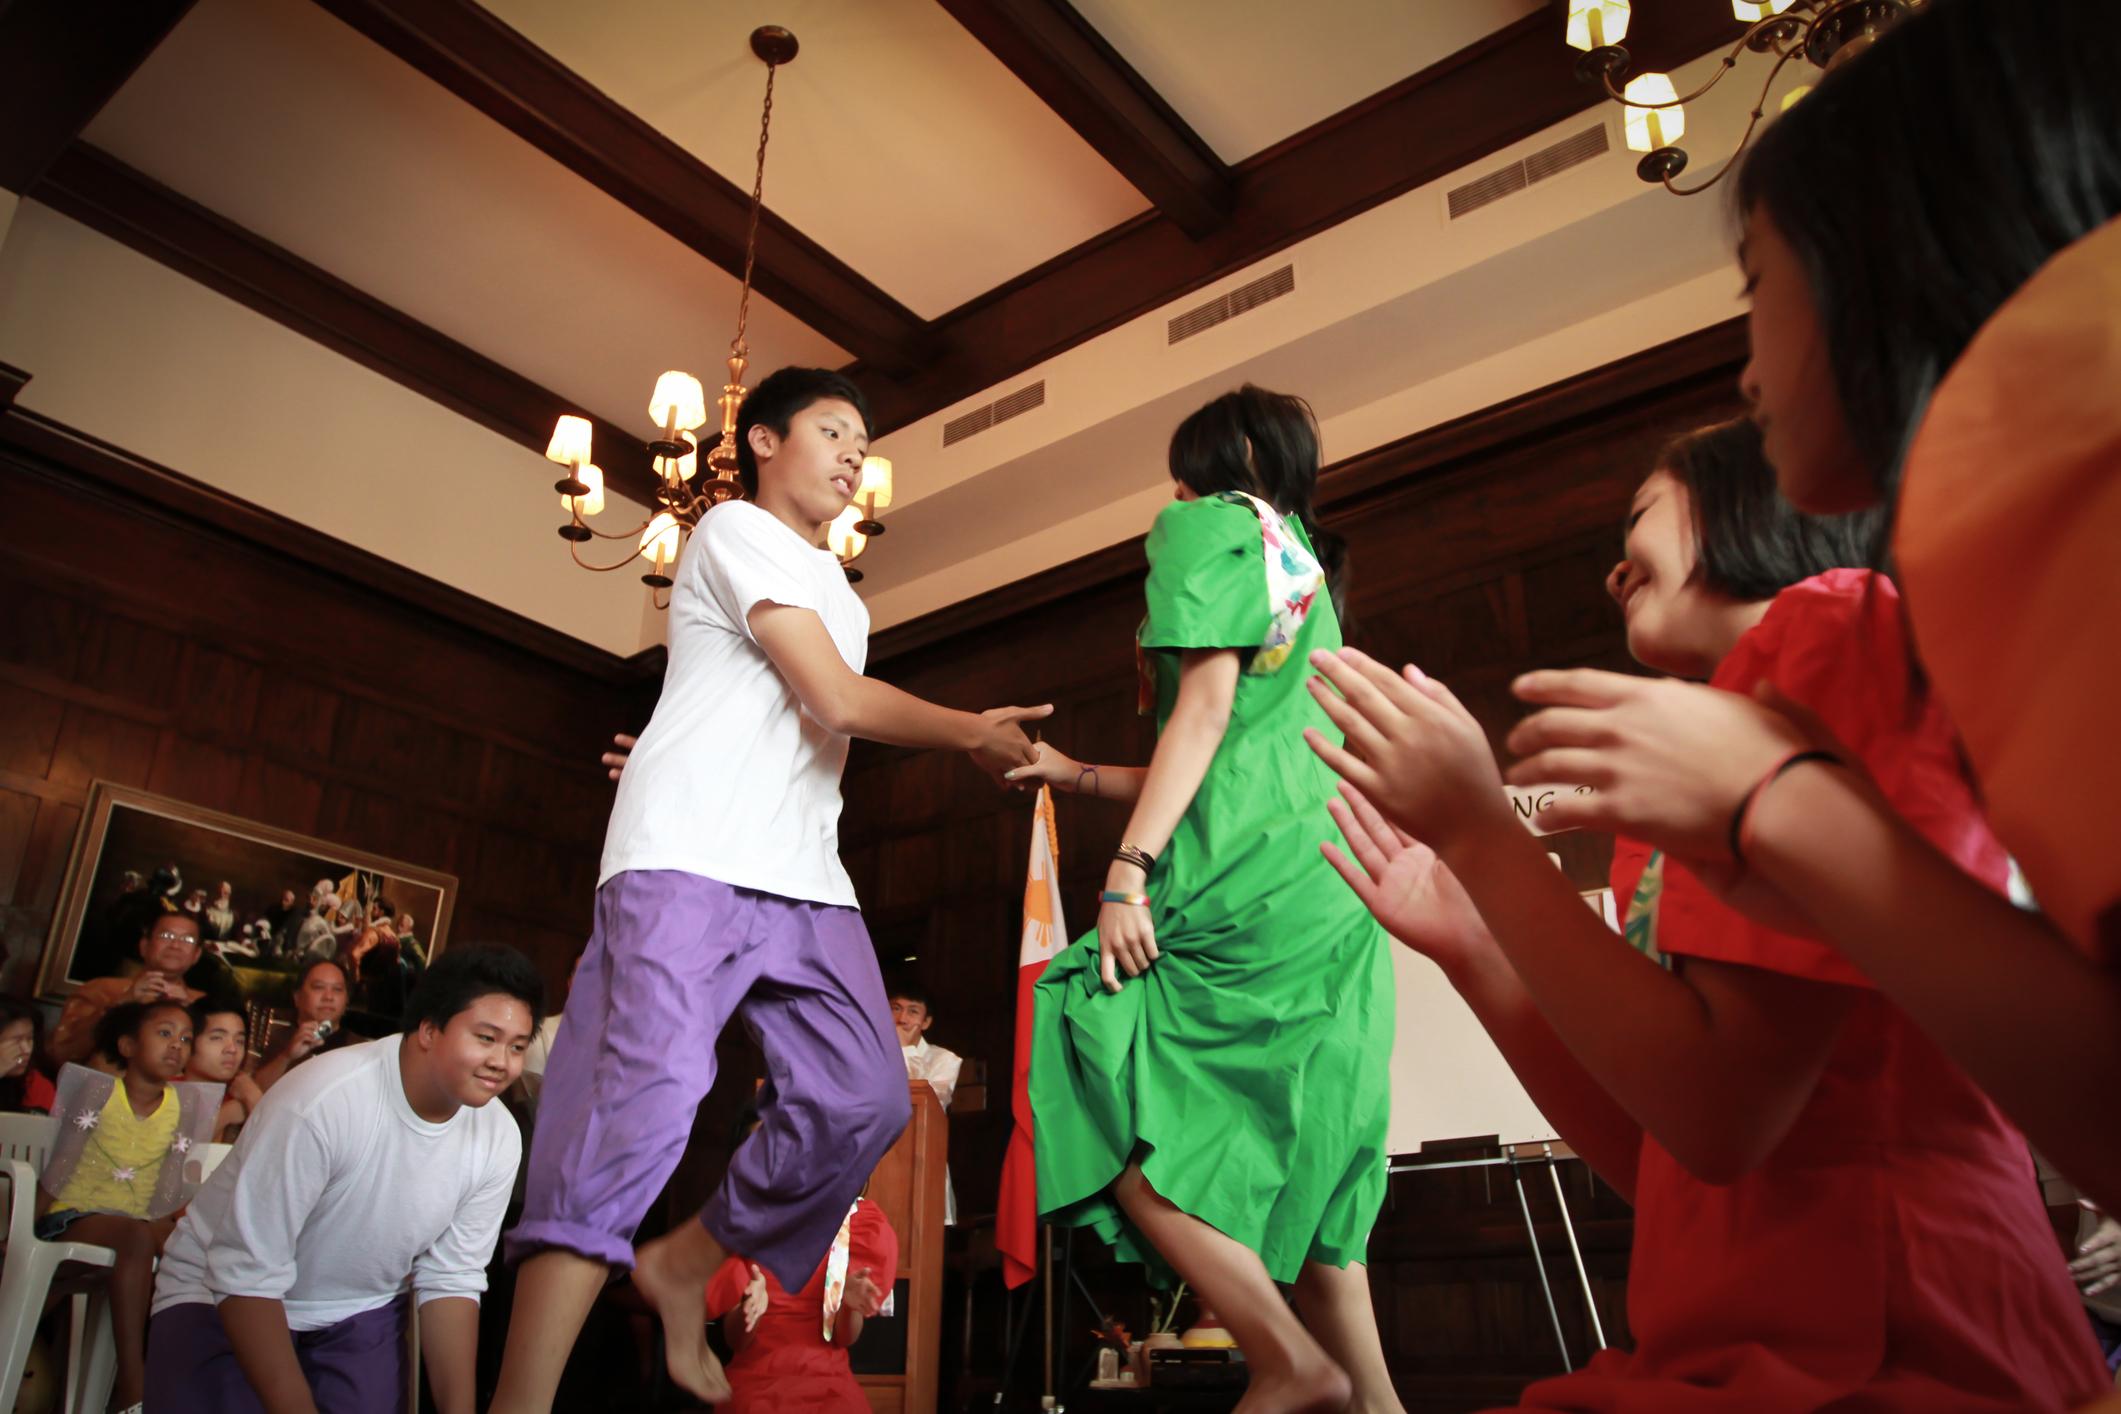 Parangal dance company philippine folk dance - Parangal Dance Company Philippine Folk Dance 45